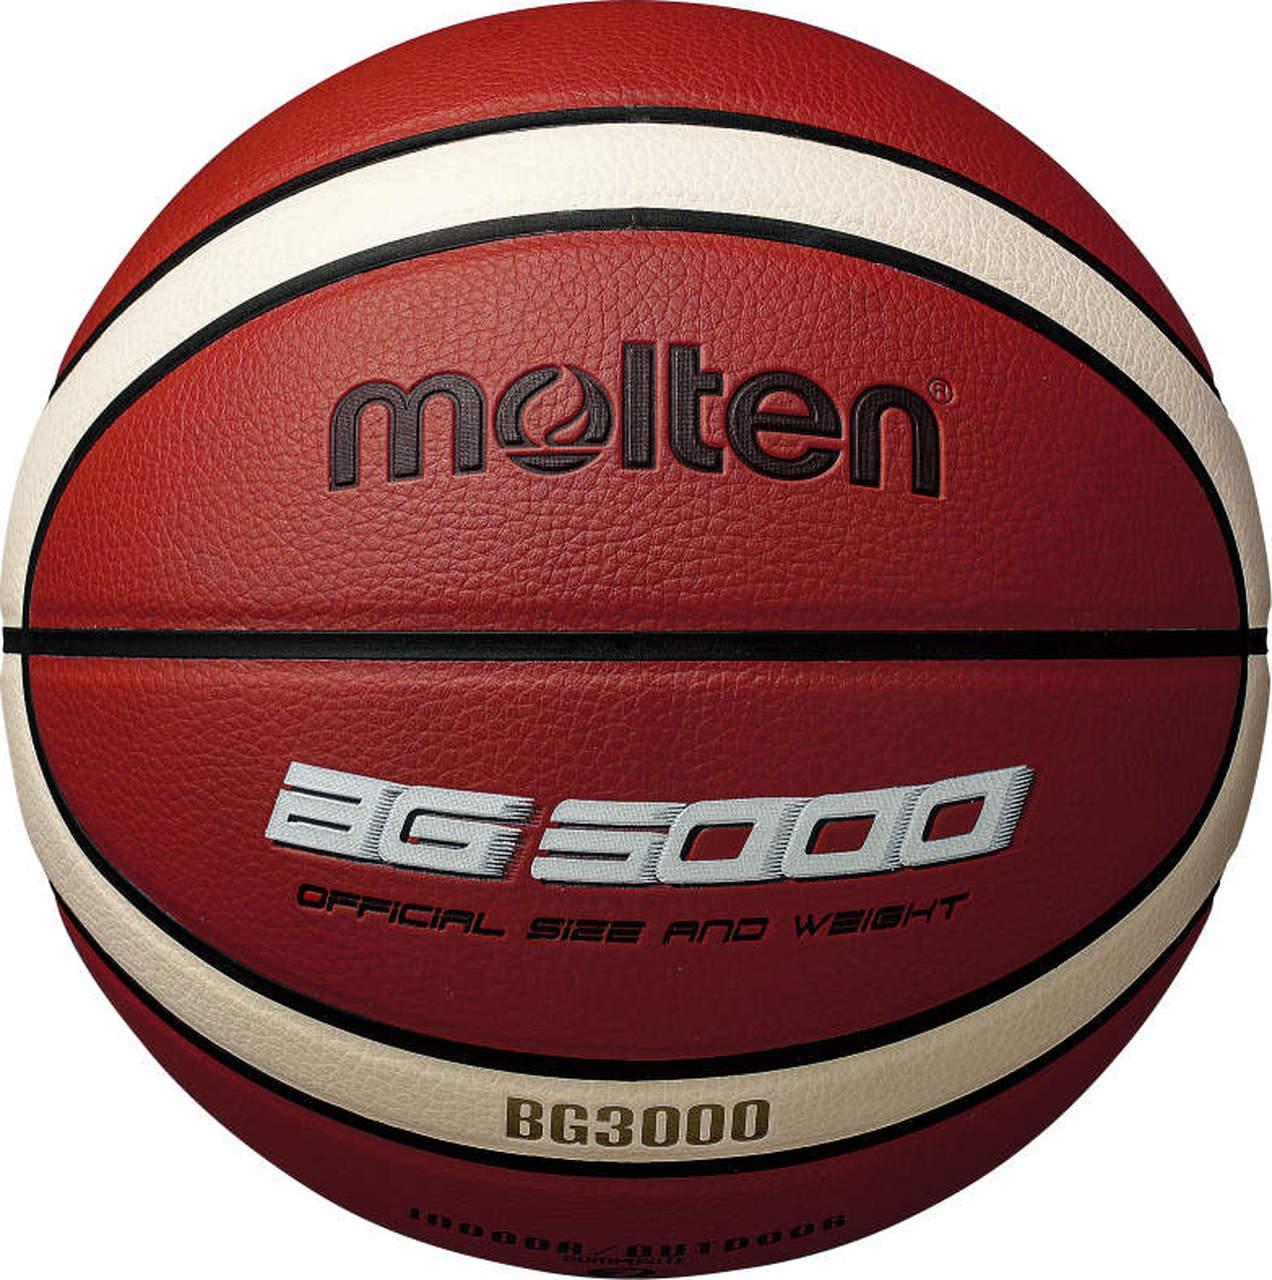 Krepšinio kamuolys MOLTEN B6G3000